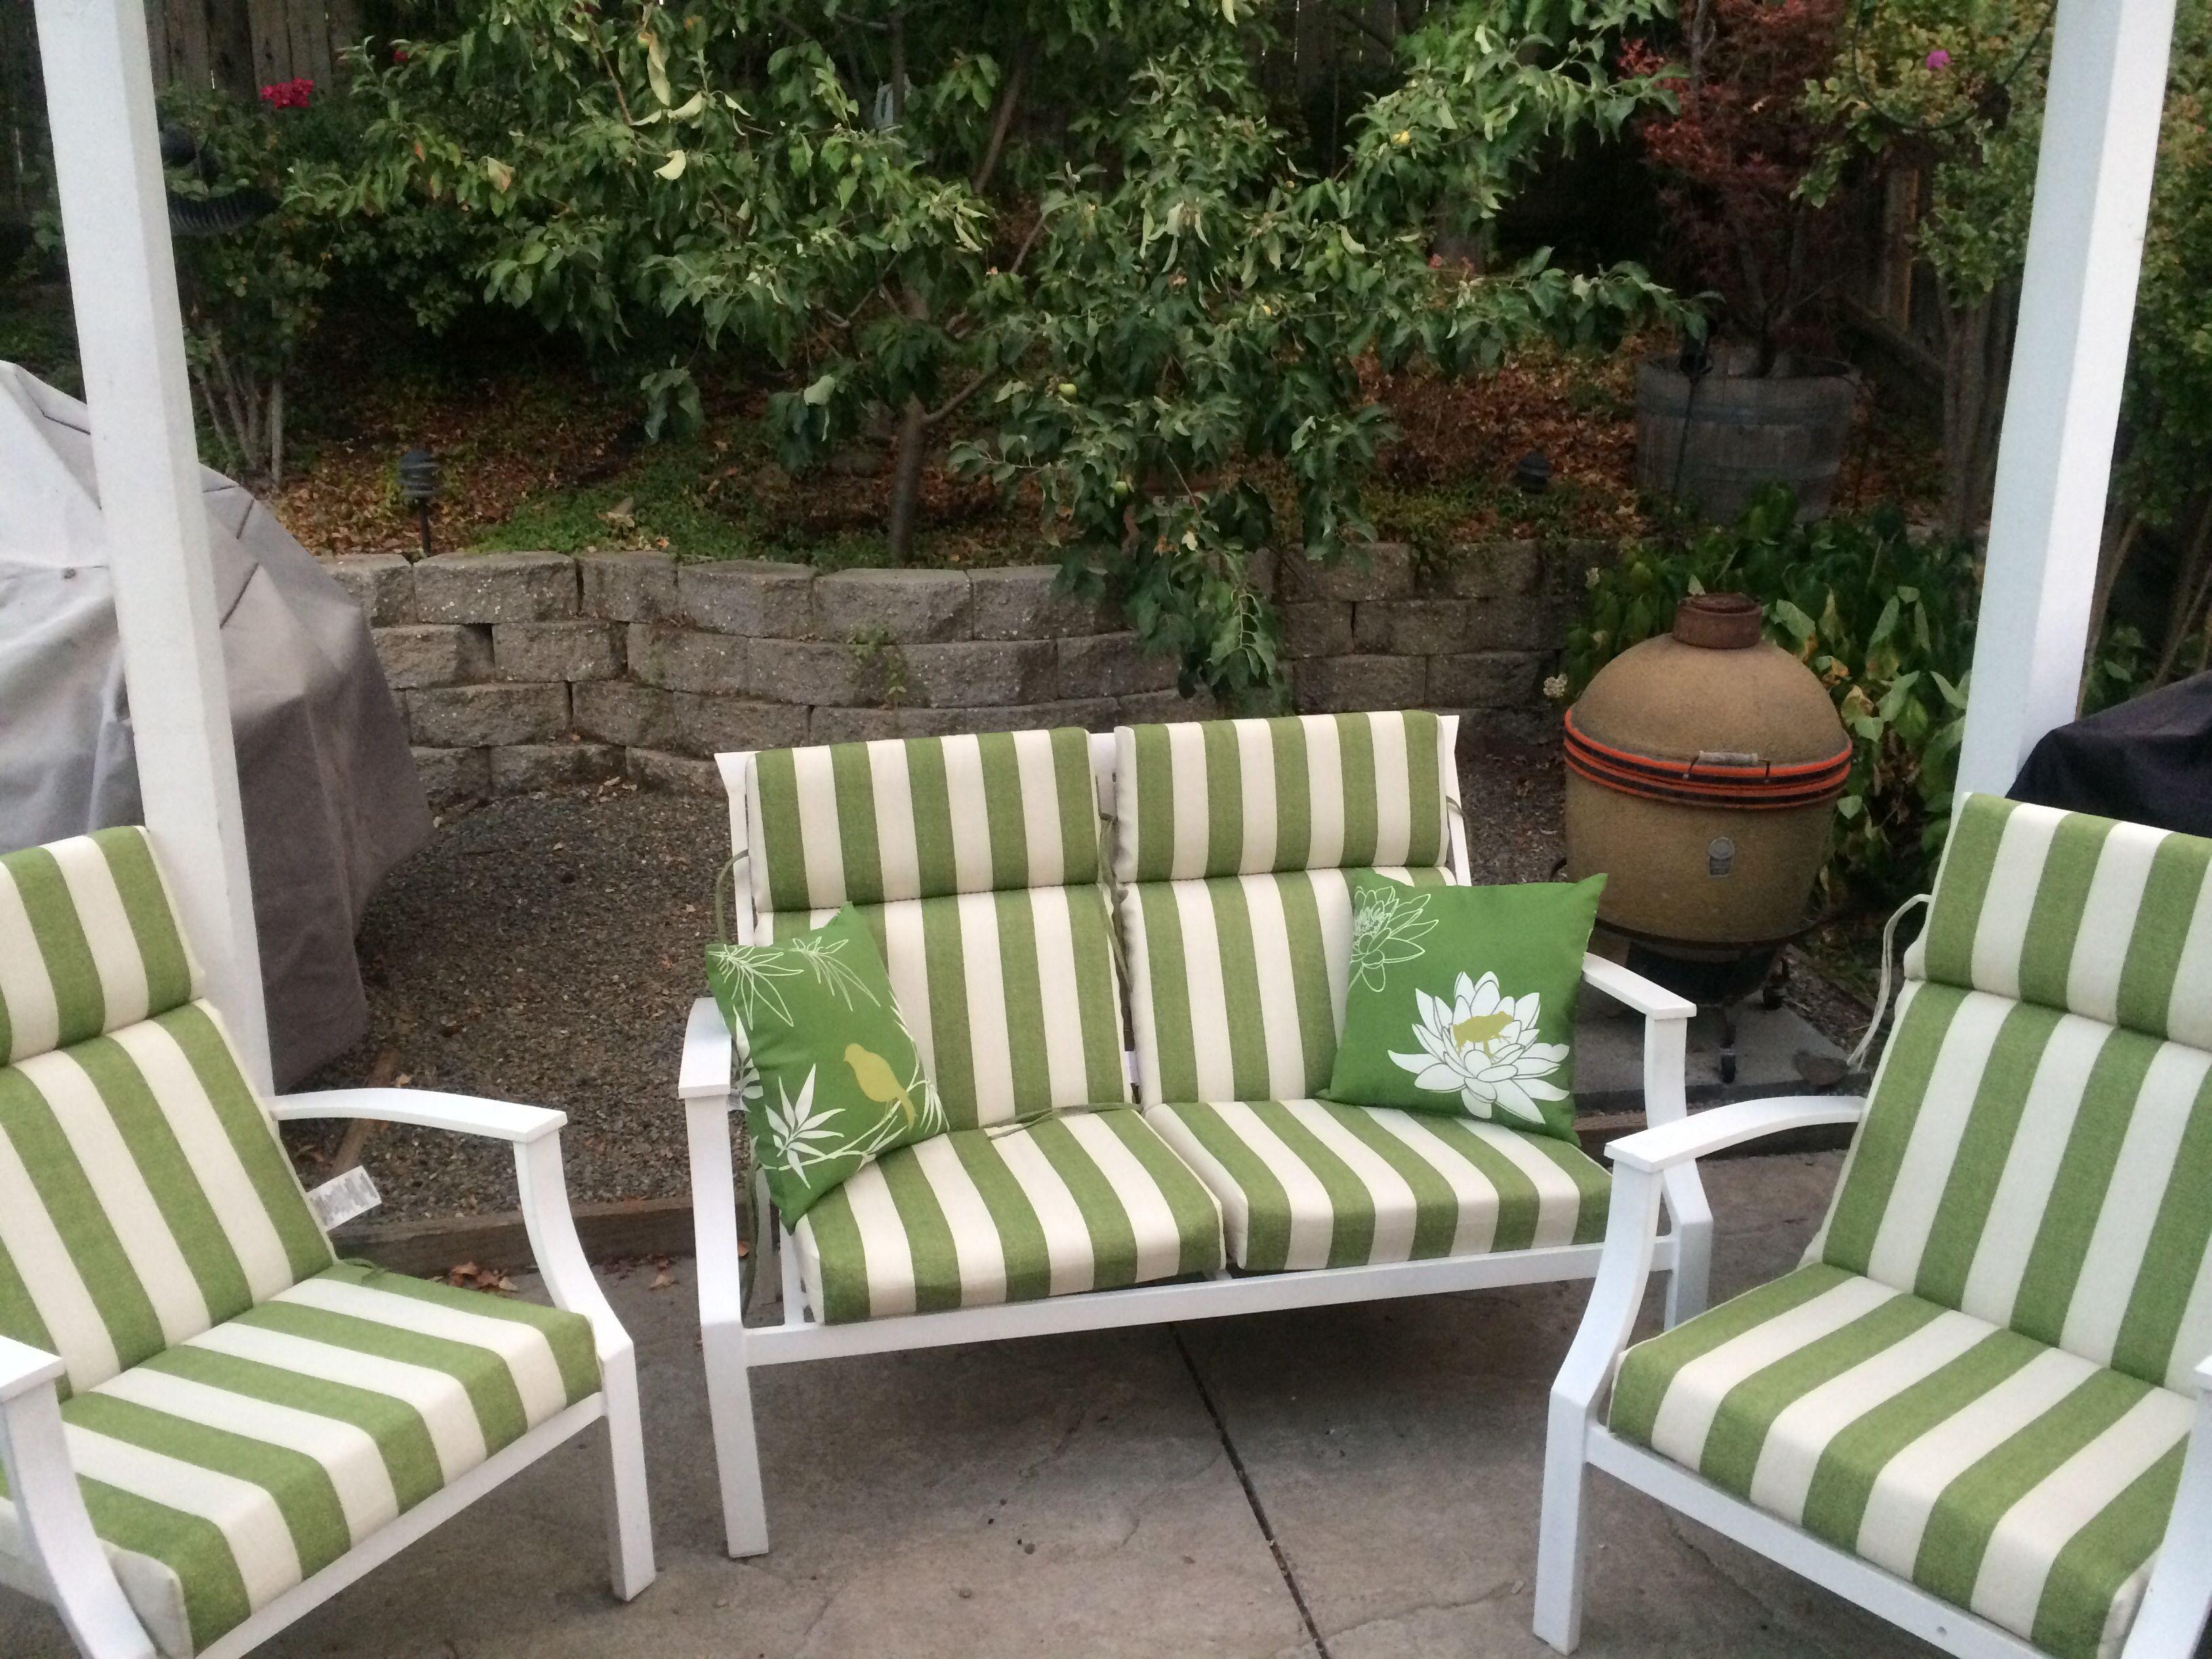 Backyard retreat. Garage sale find furniture with cushions